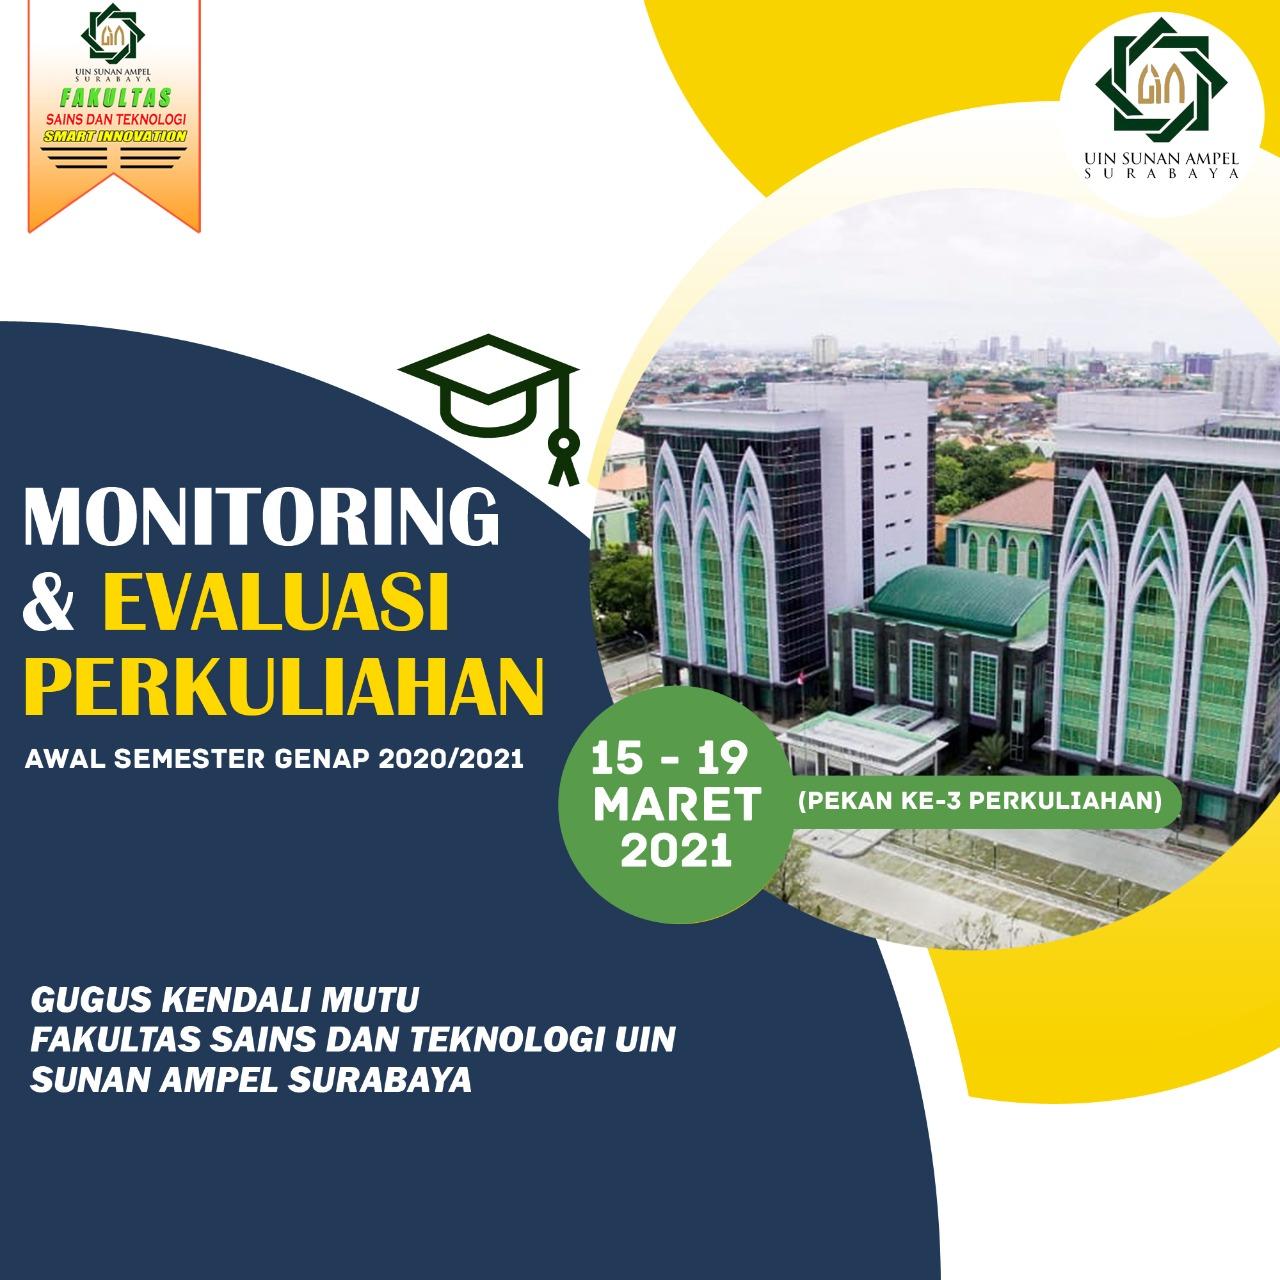 Kegiatan Monitoring dan Evaluasi Perkuliahan di awal semester genap 2020/2021